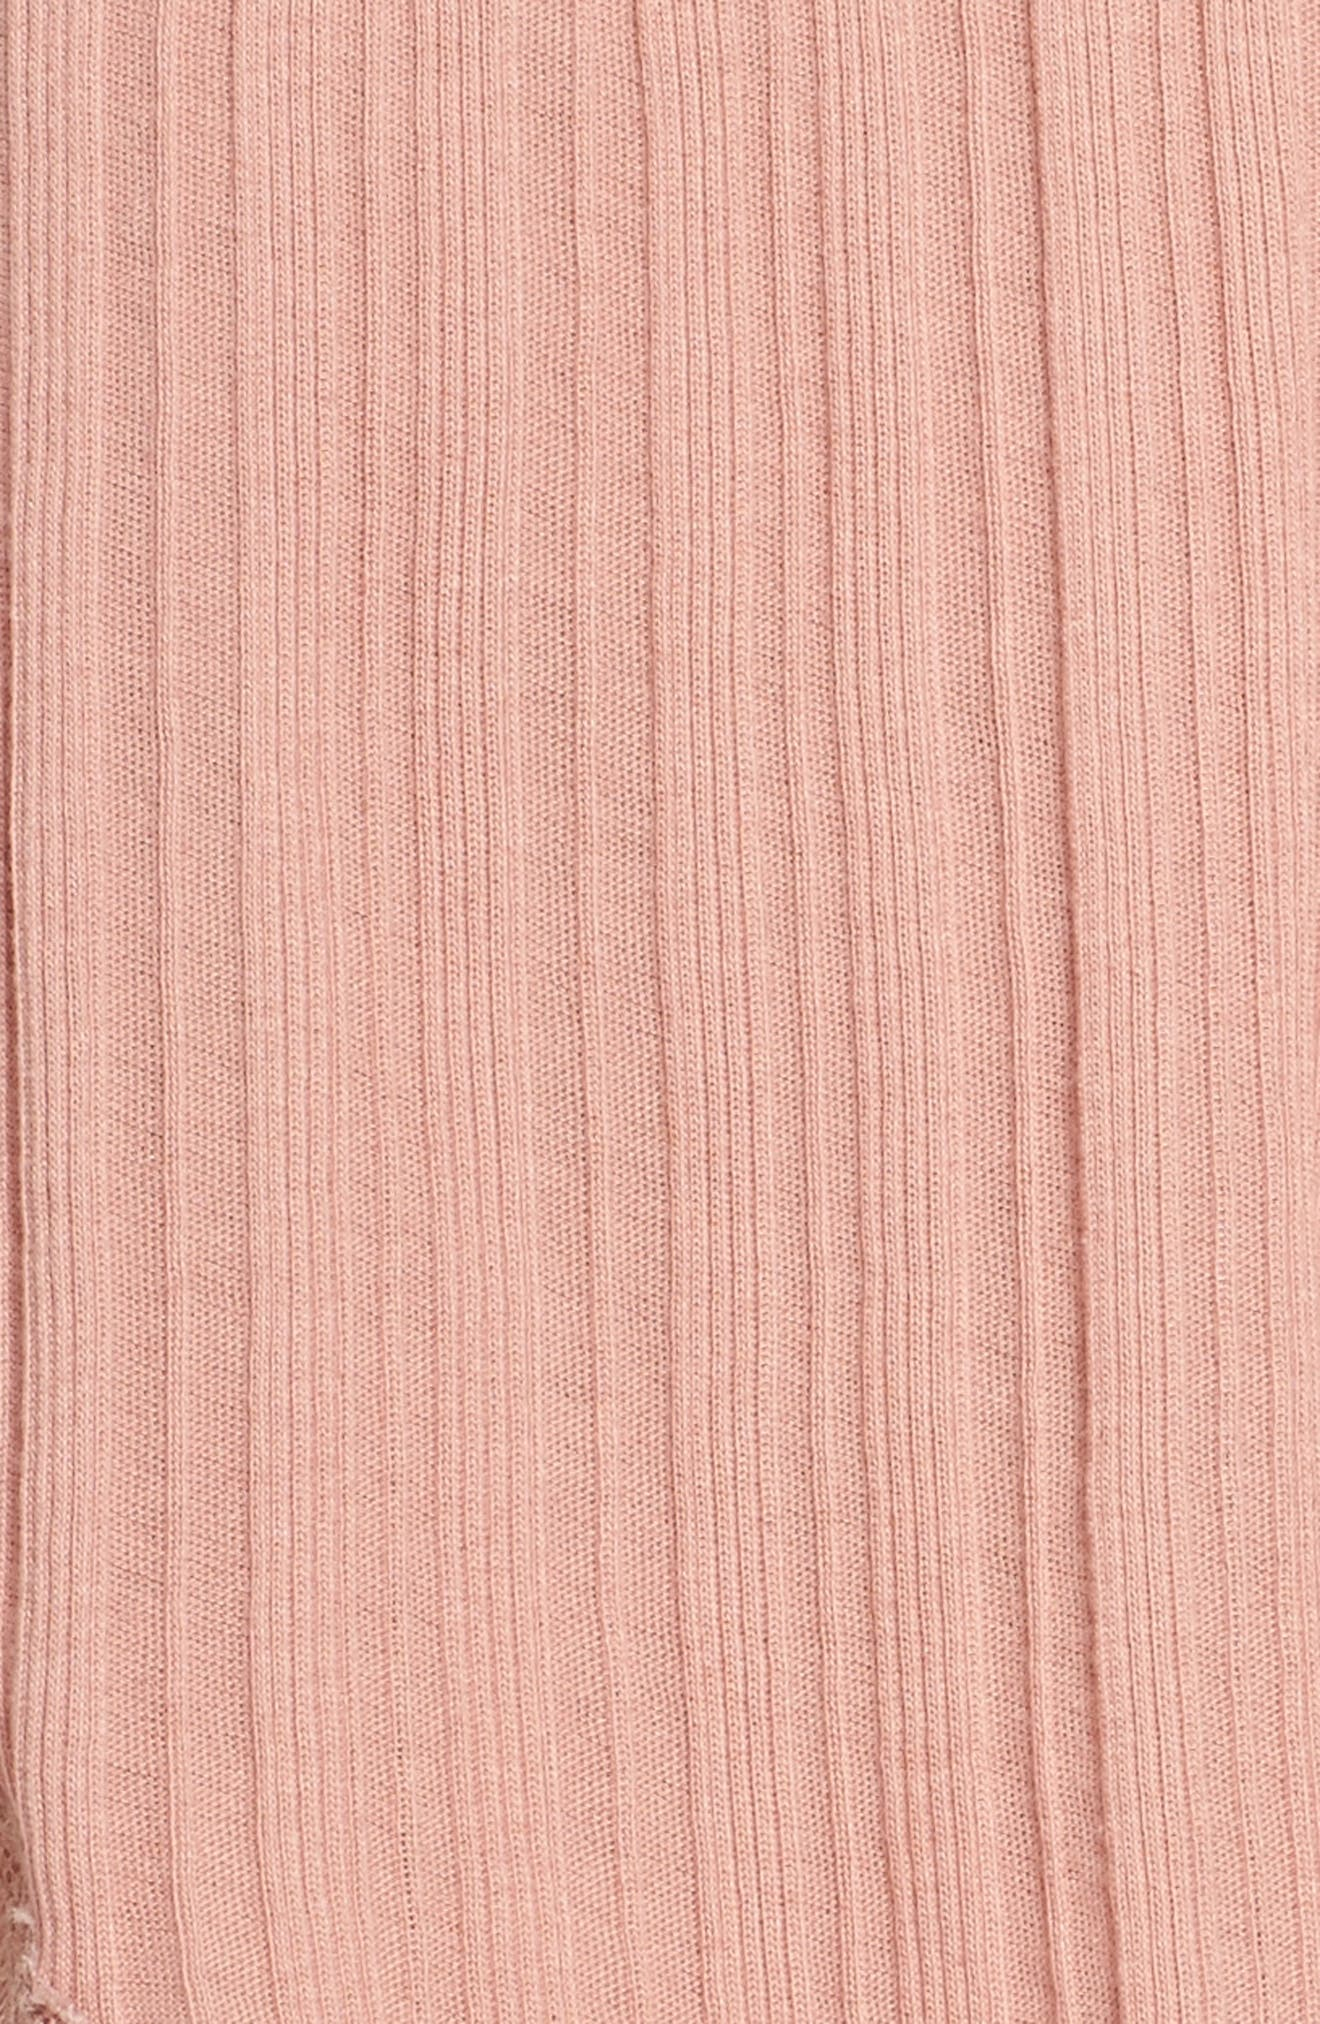 Ribbed Shorts,                             Alternate thumbnail 6, color,                             Vintage Pink